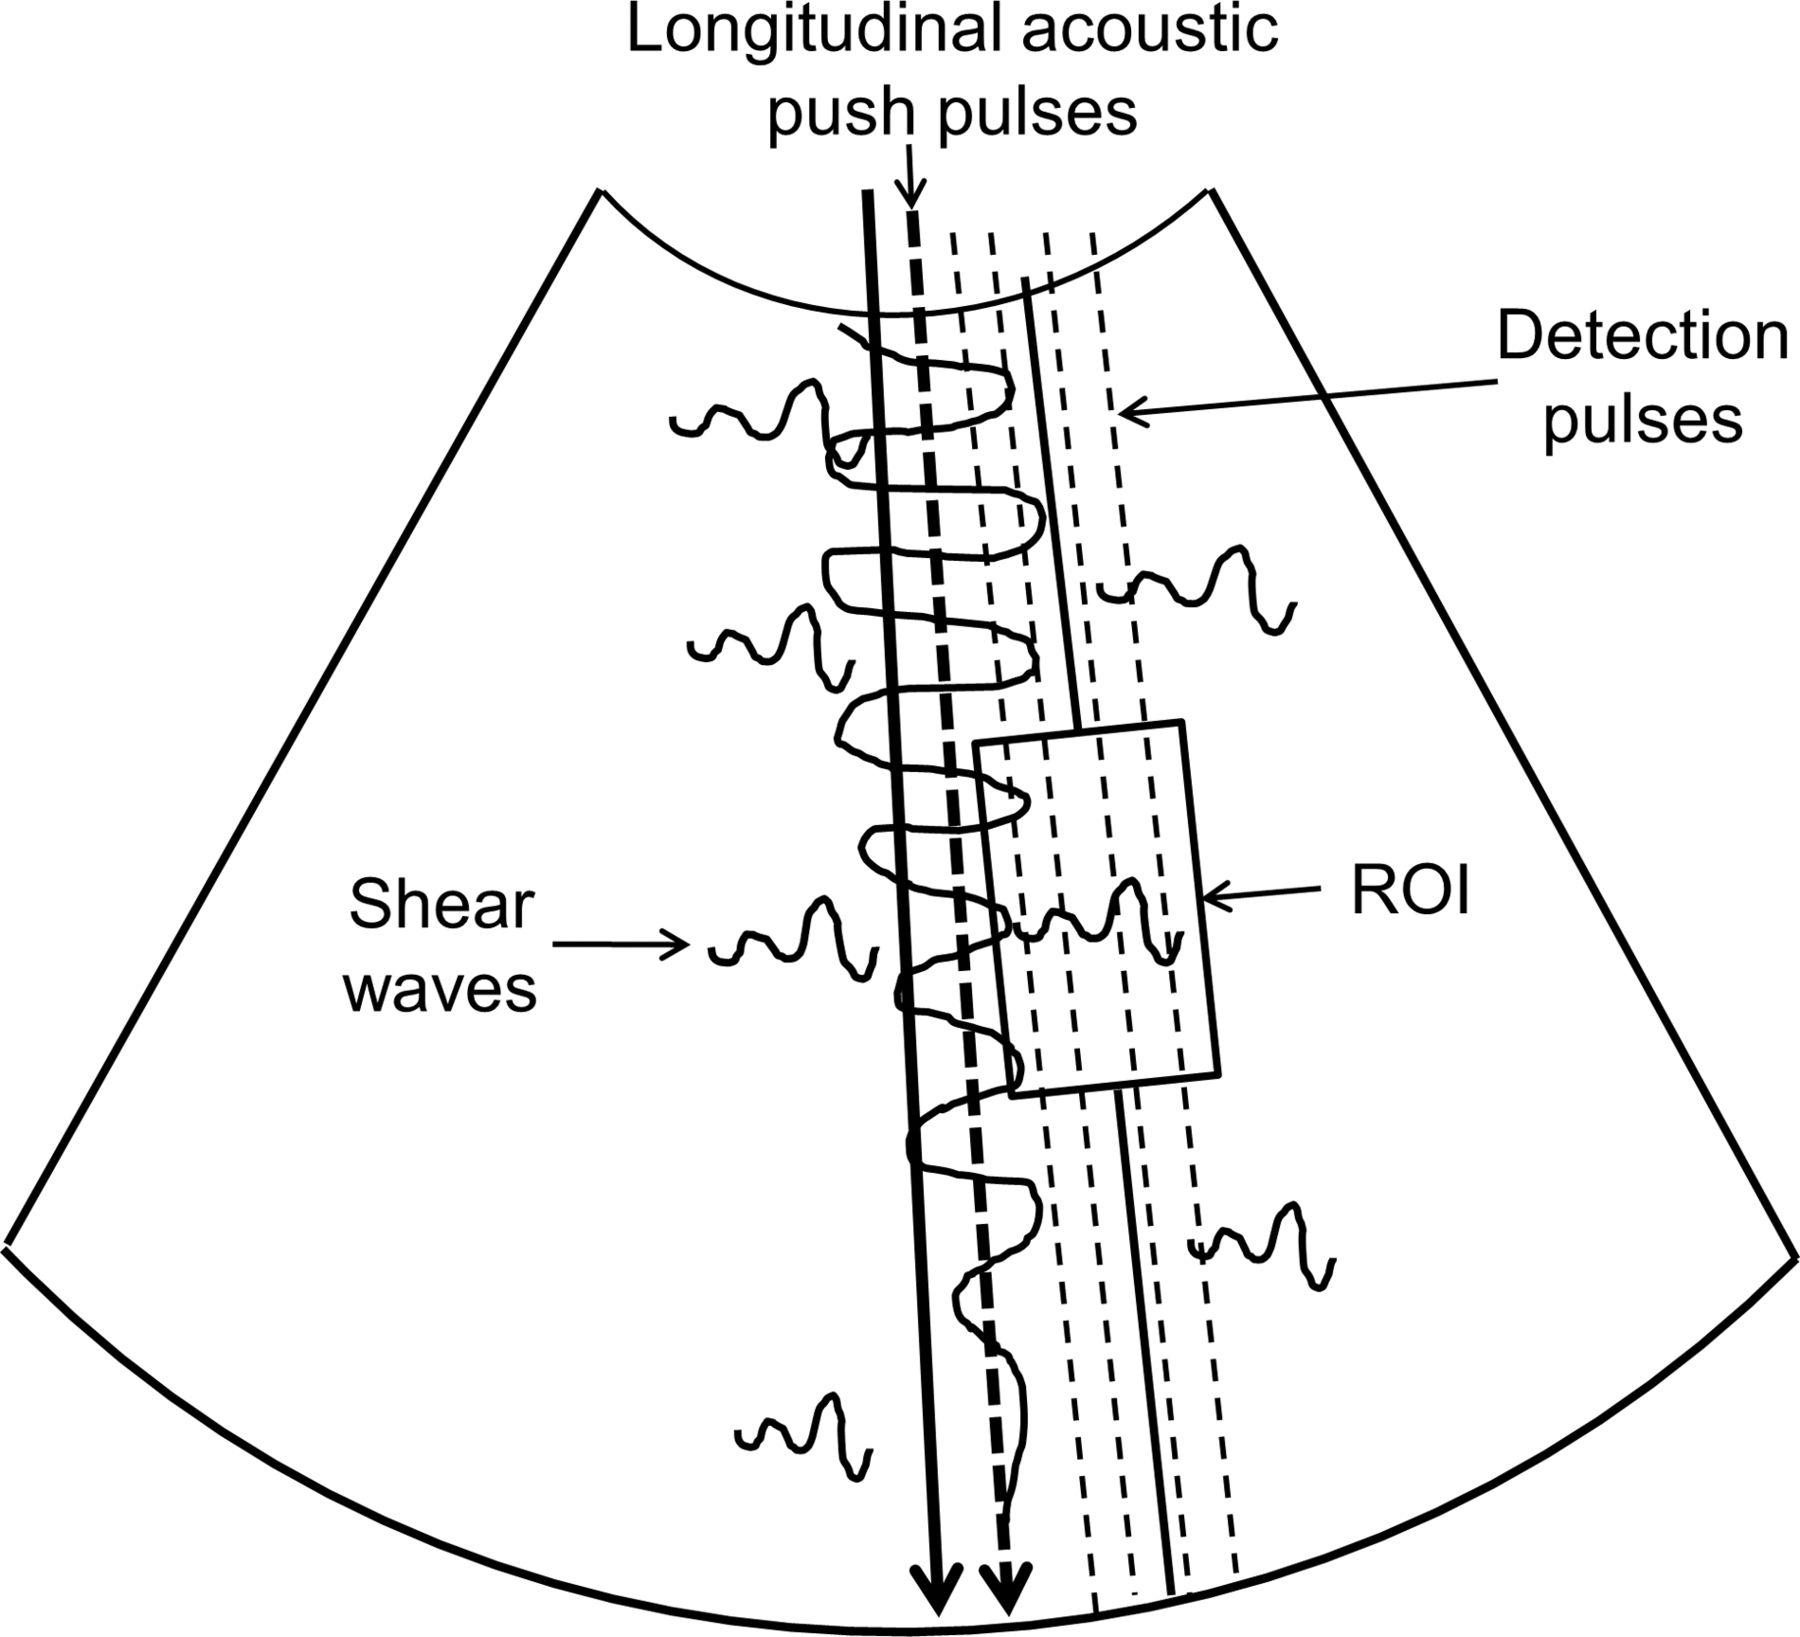 Virtual touch quantification (VTq) elastography for non